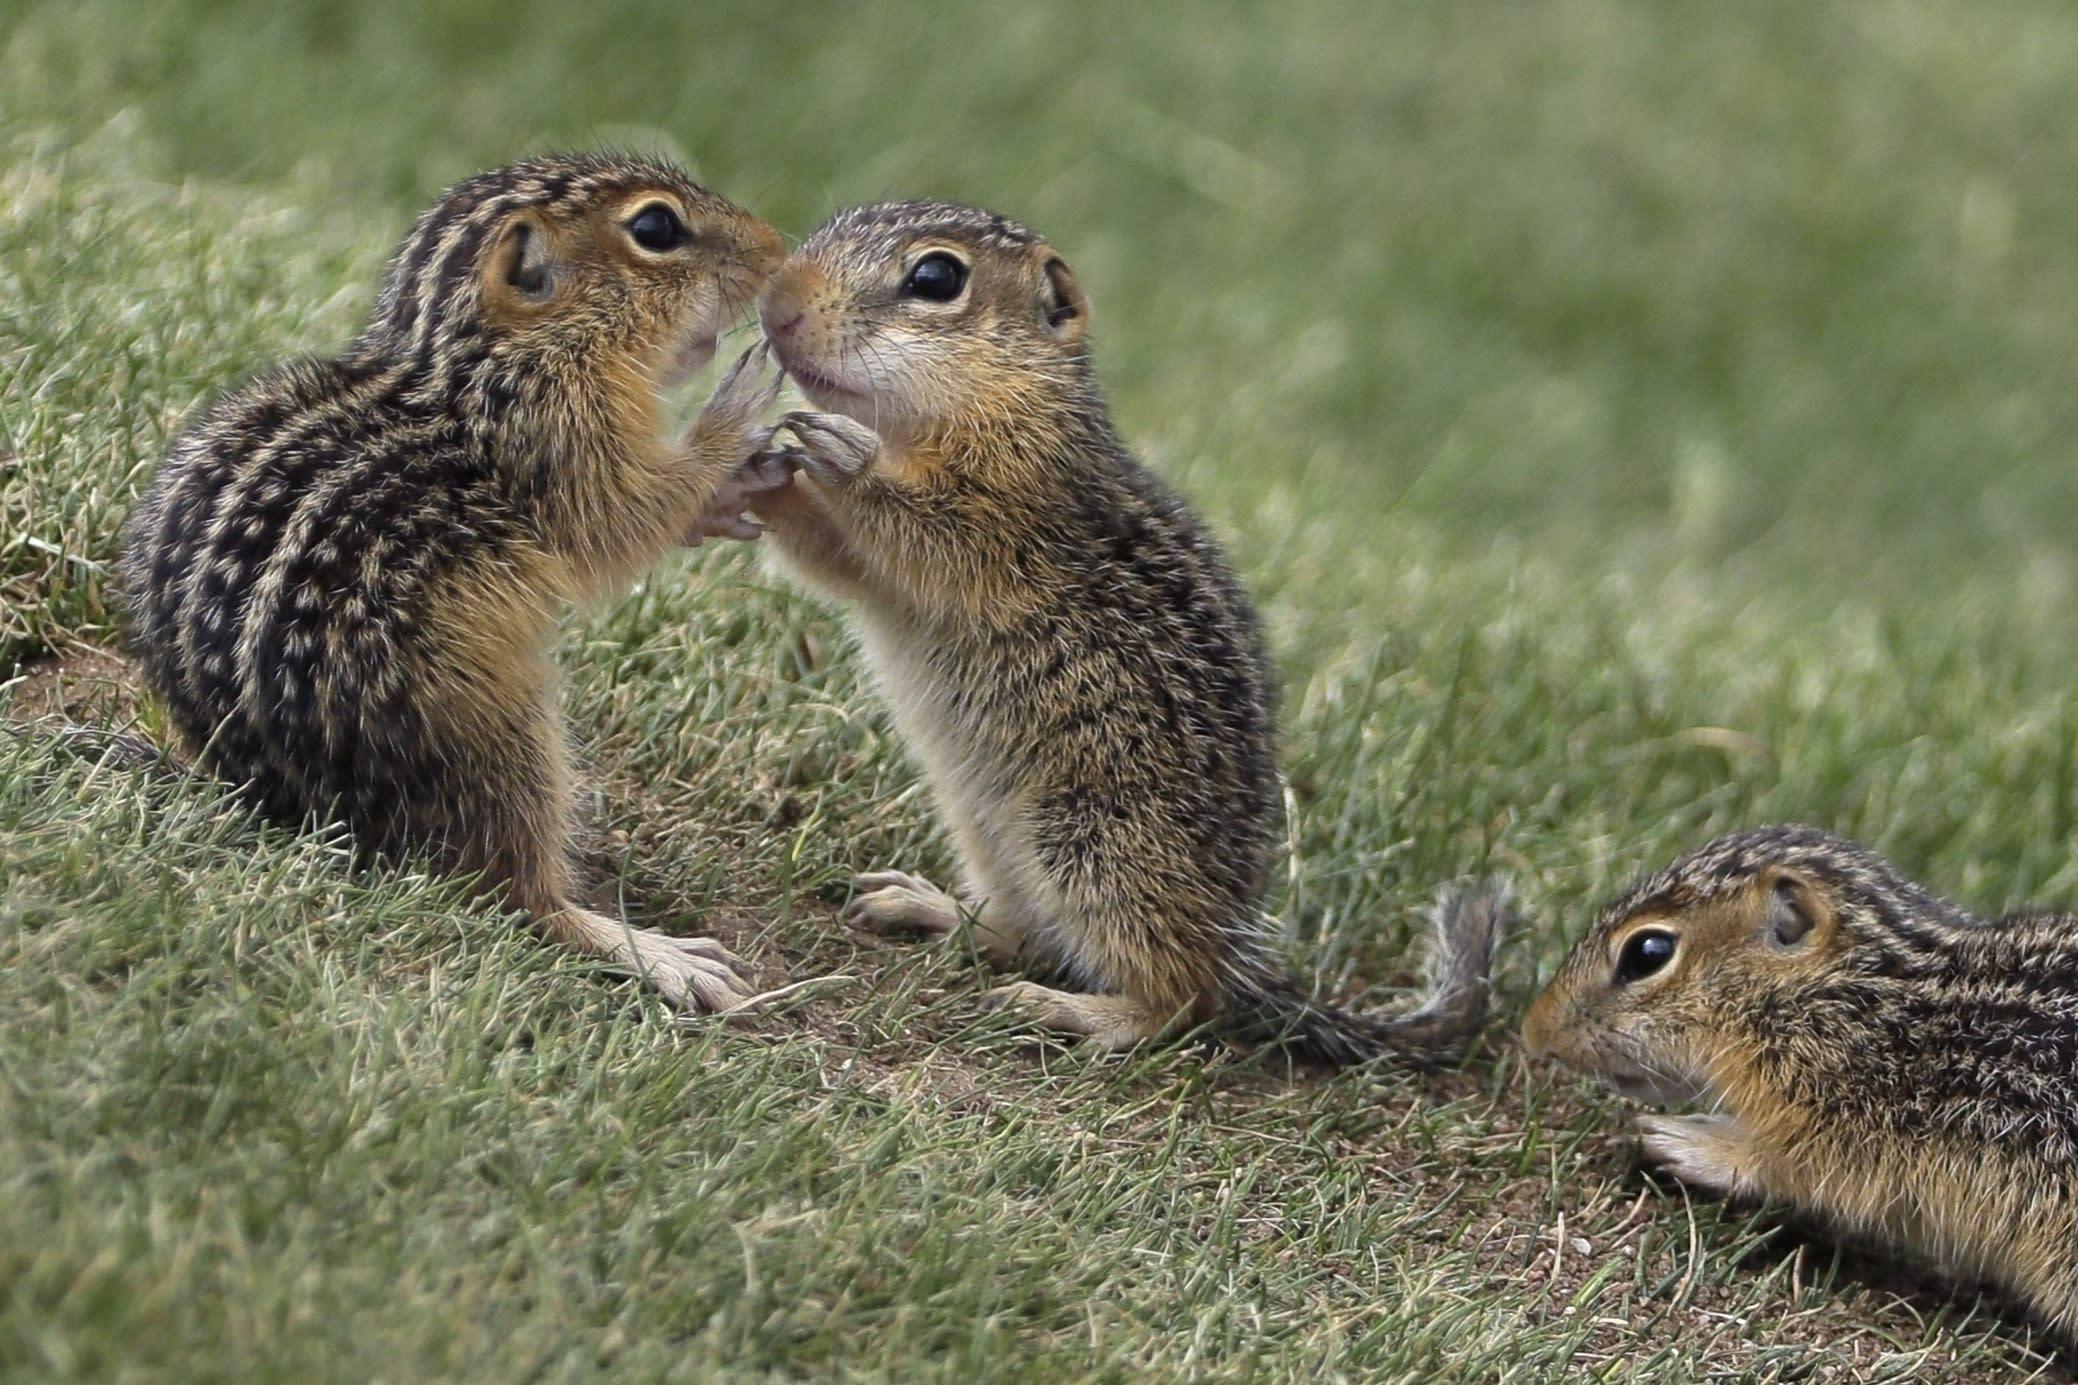 Chipmunks Amok